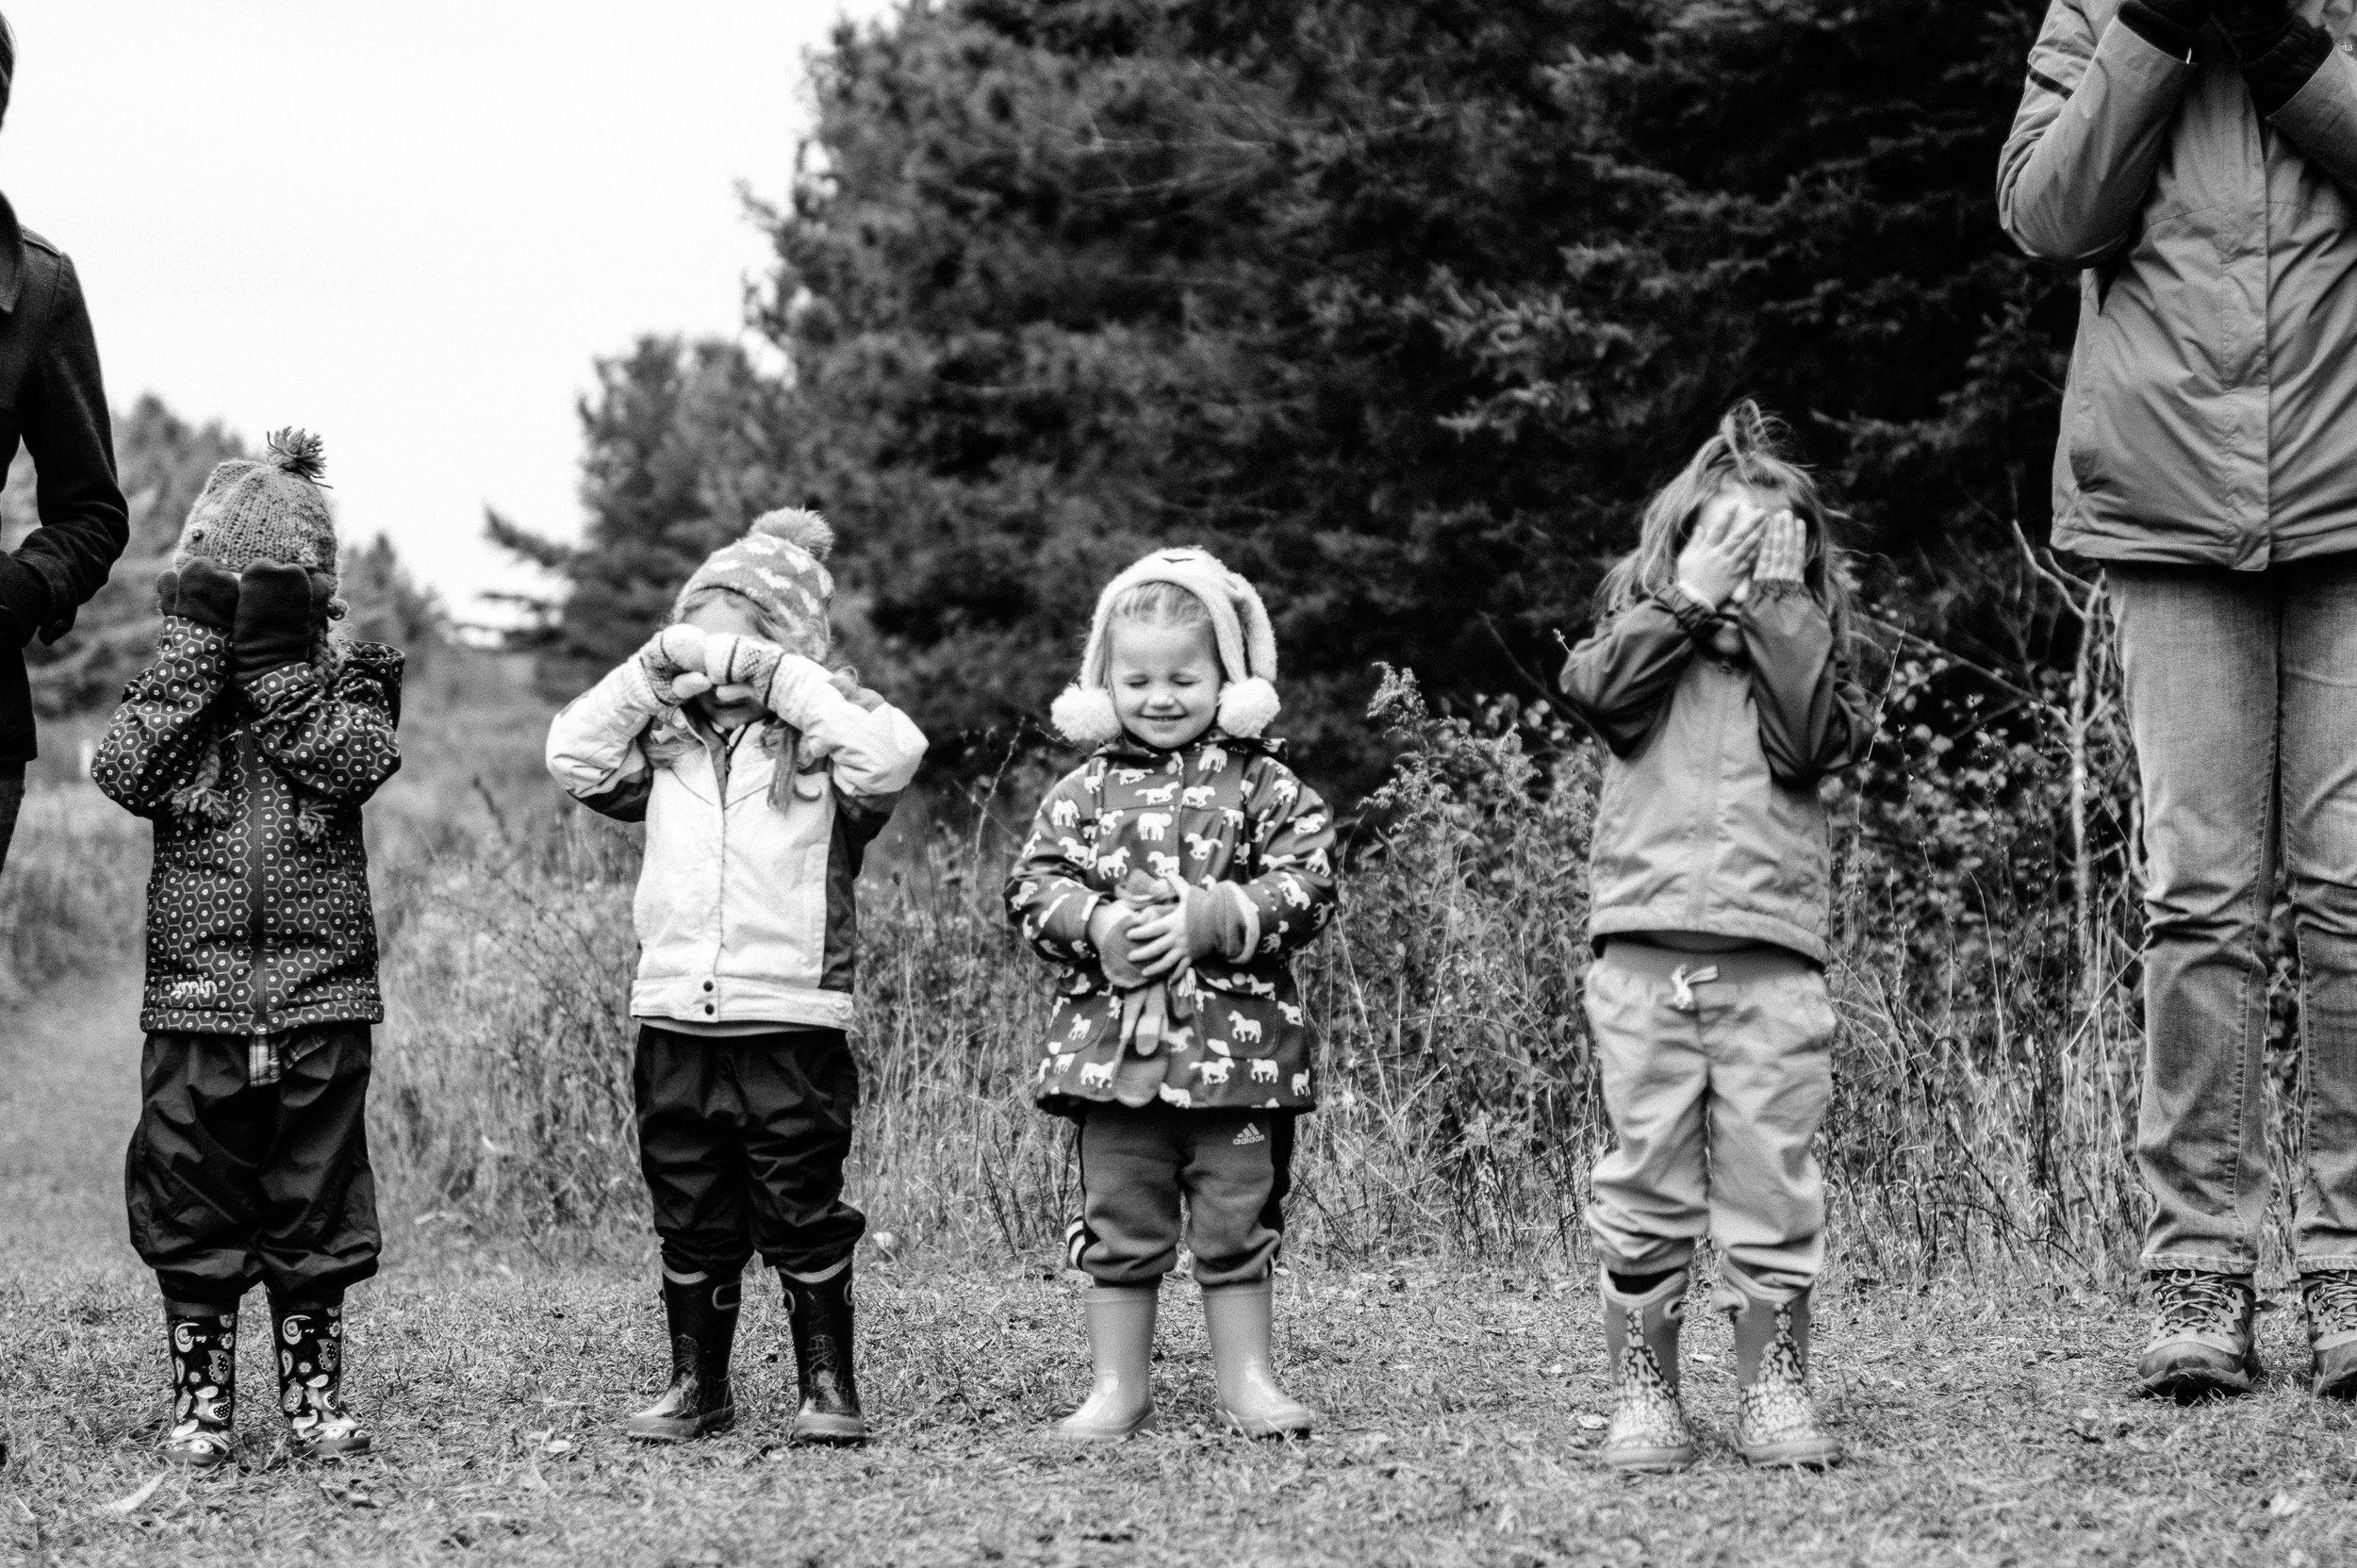 documentary school photography viara mileva kingston toronto ottawa-174221vm.jpg